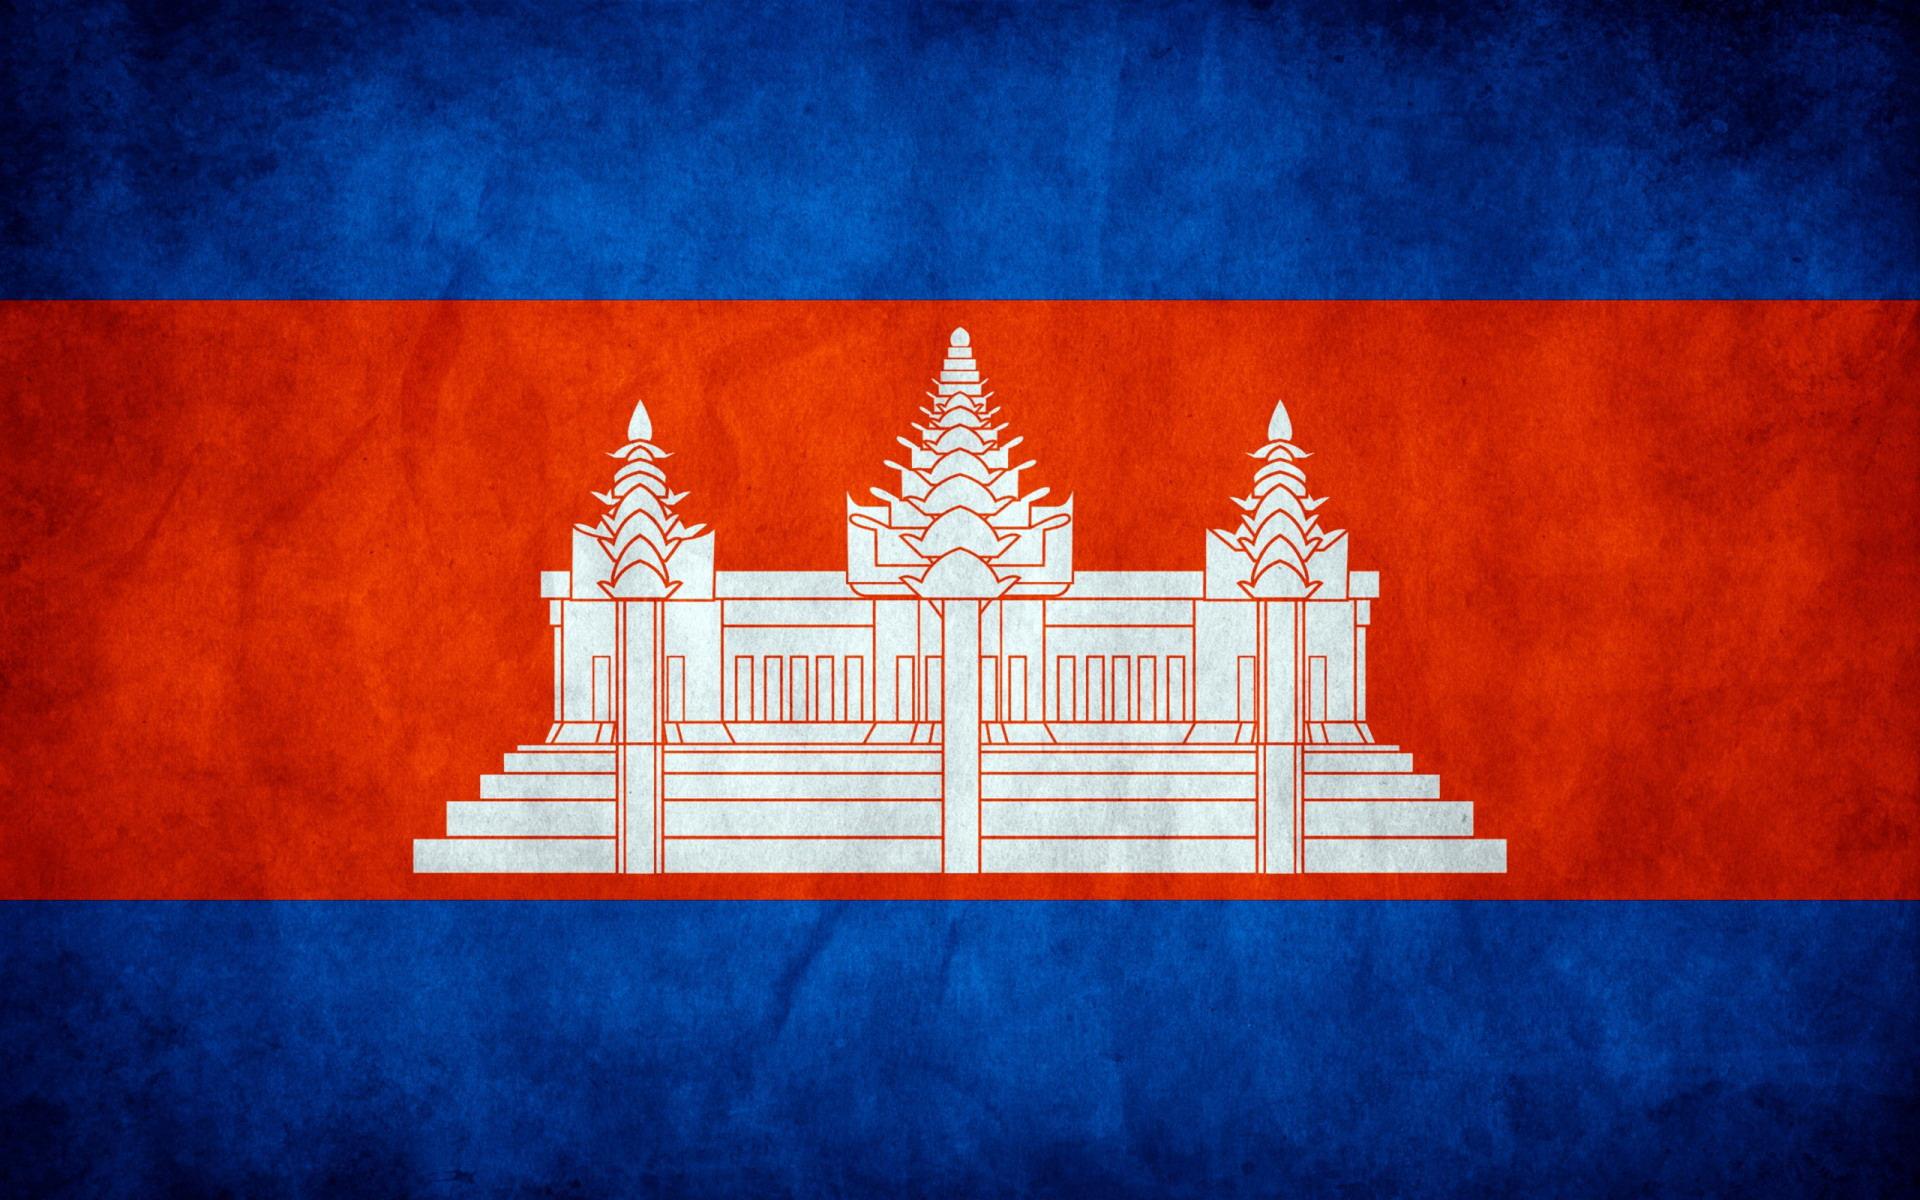 флаг камбоджа фото вот, покраске сборке